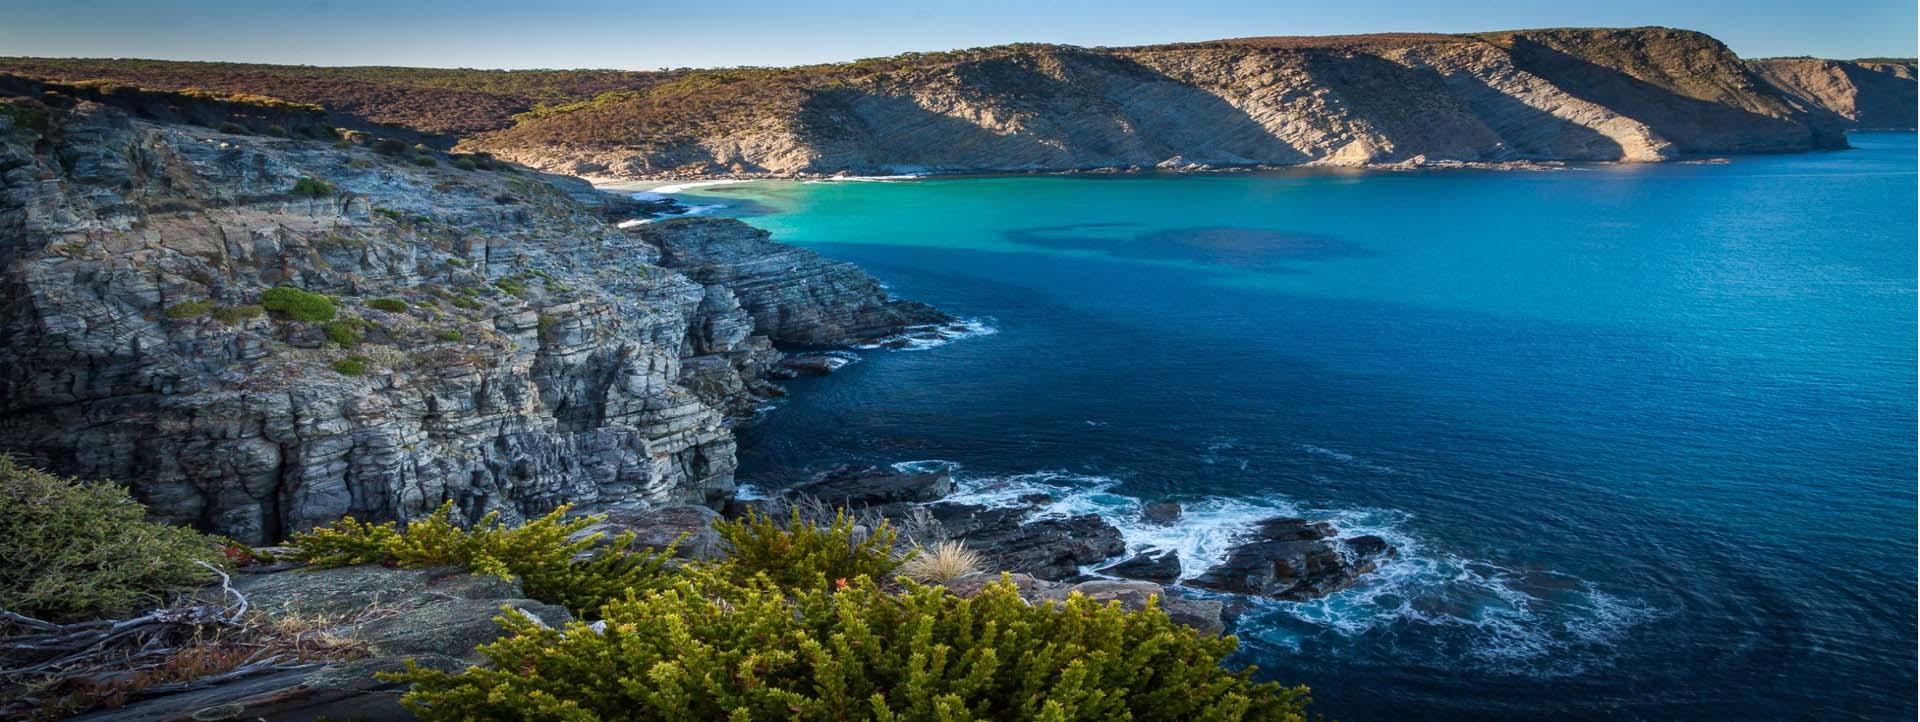 CORAL ADVENTURER Wild Island Walks Itinerary South Australia ocean cliffs